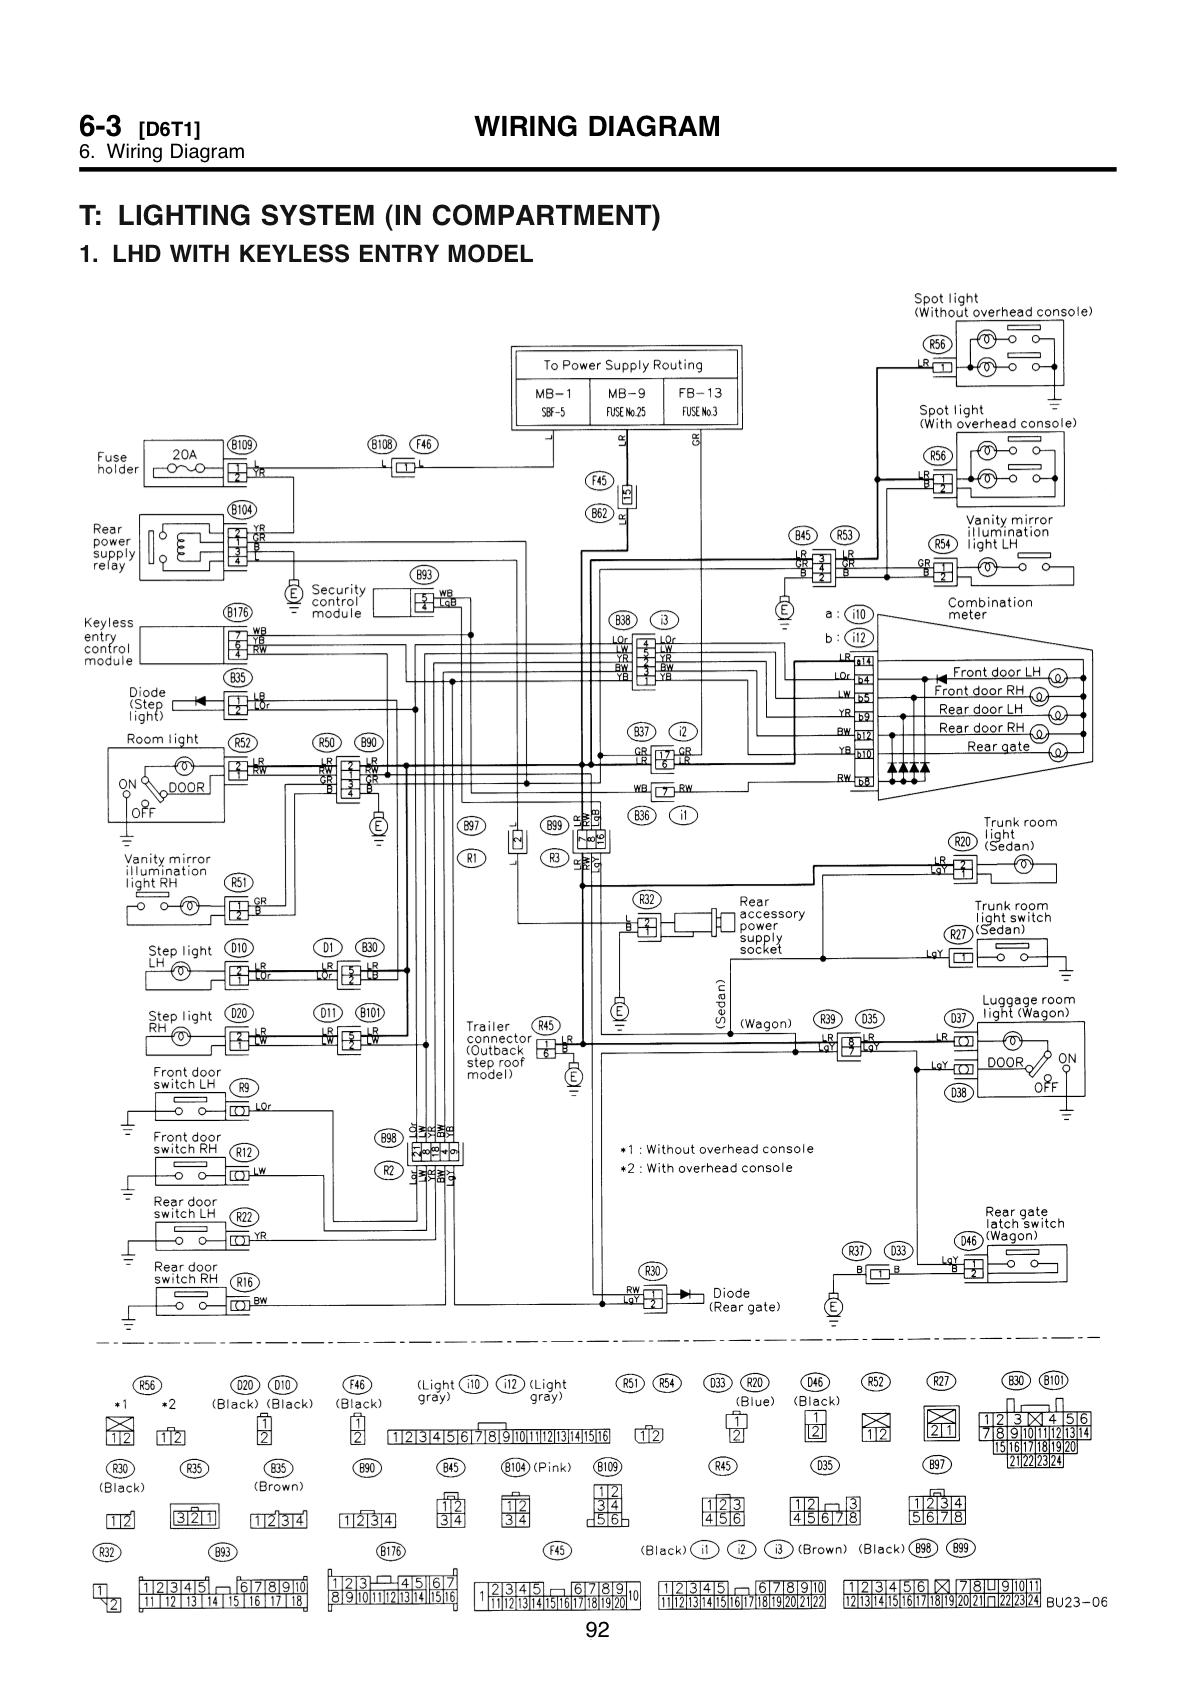 1999 Subaru Wiring Diagram - Wiring Diagram All versed-credibility -  versed-credibility.huevoprint.it | 99 Subaru Impreza Wiring Diagram |  | Huevoprint